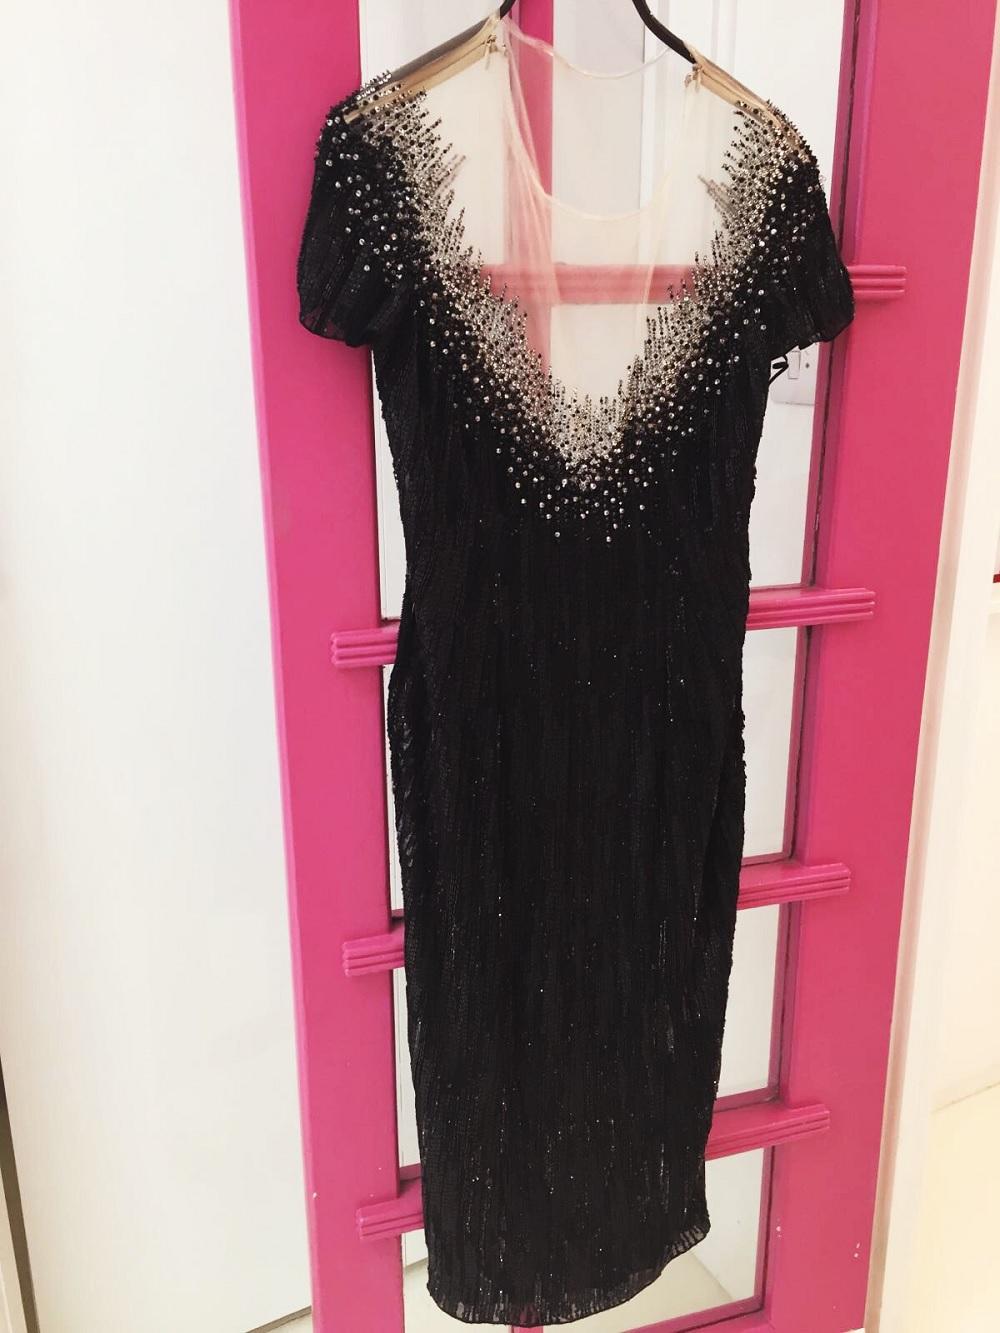 Dress Alterations London